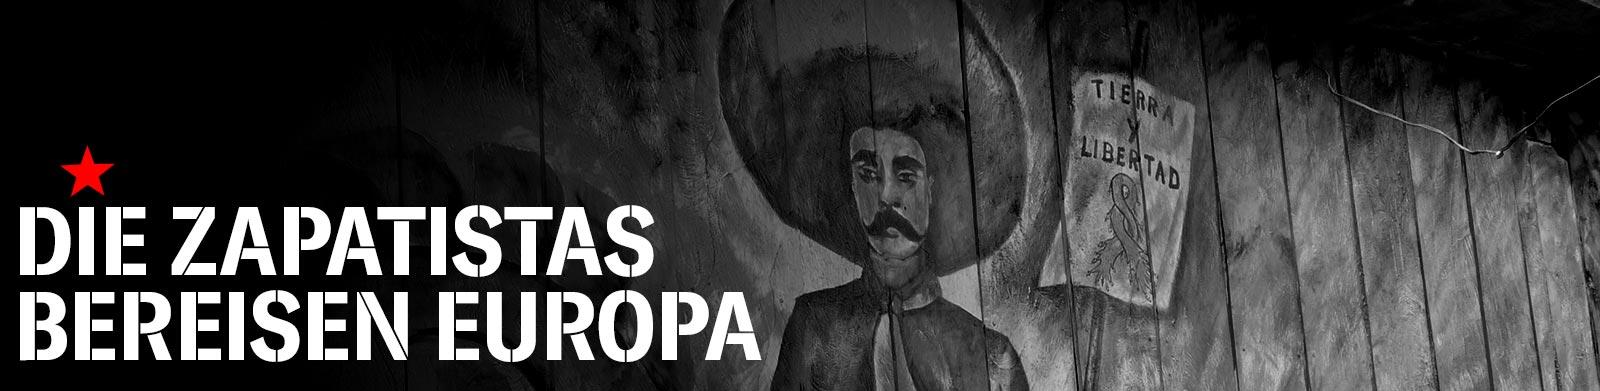 die Zapatistas bereisen europa